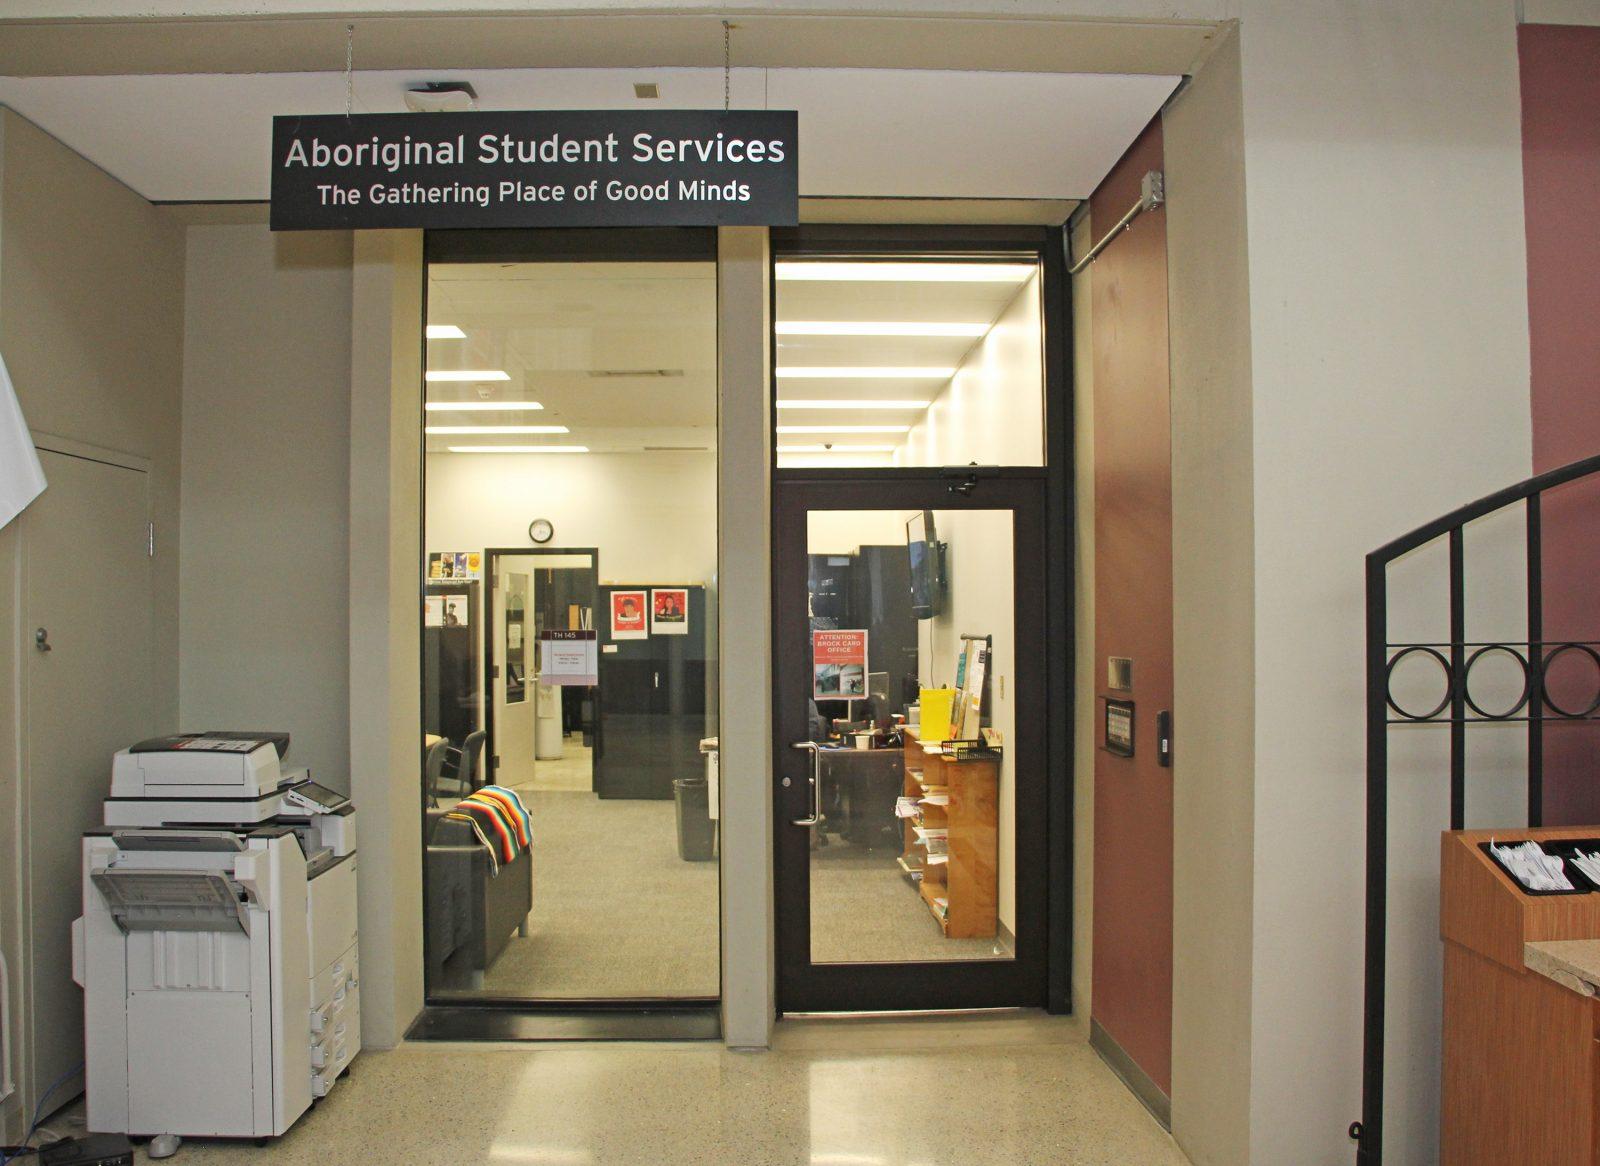 Aboriginal Student Services